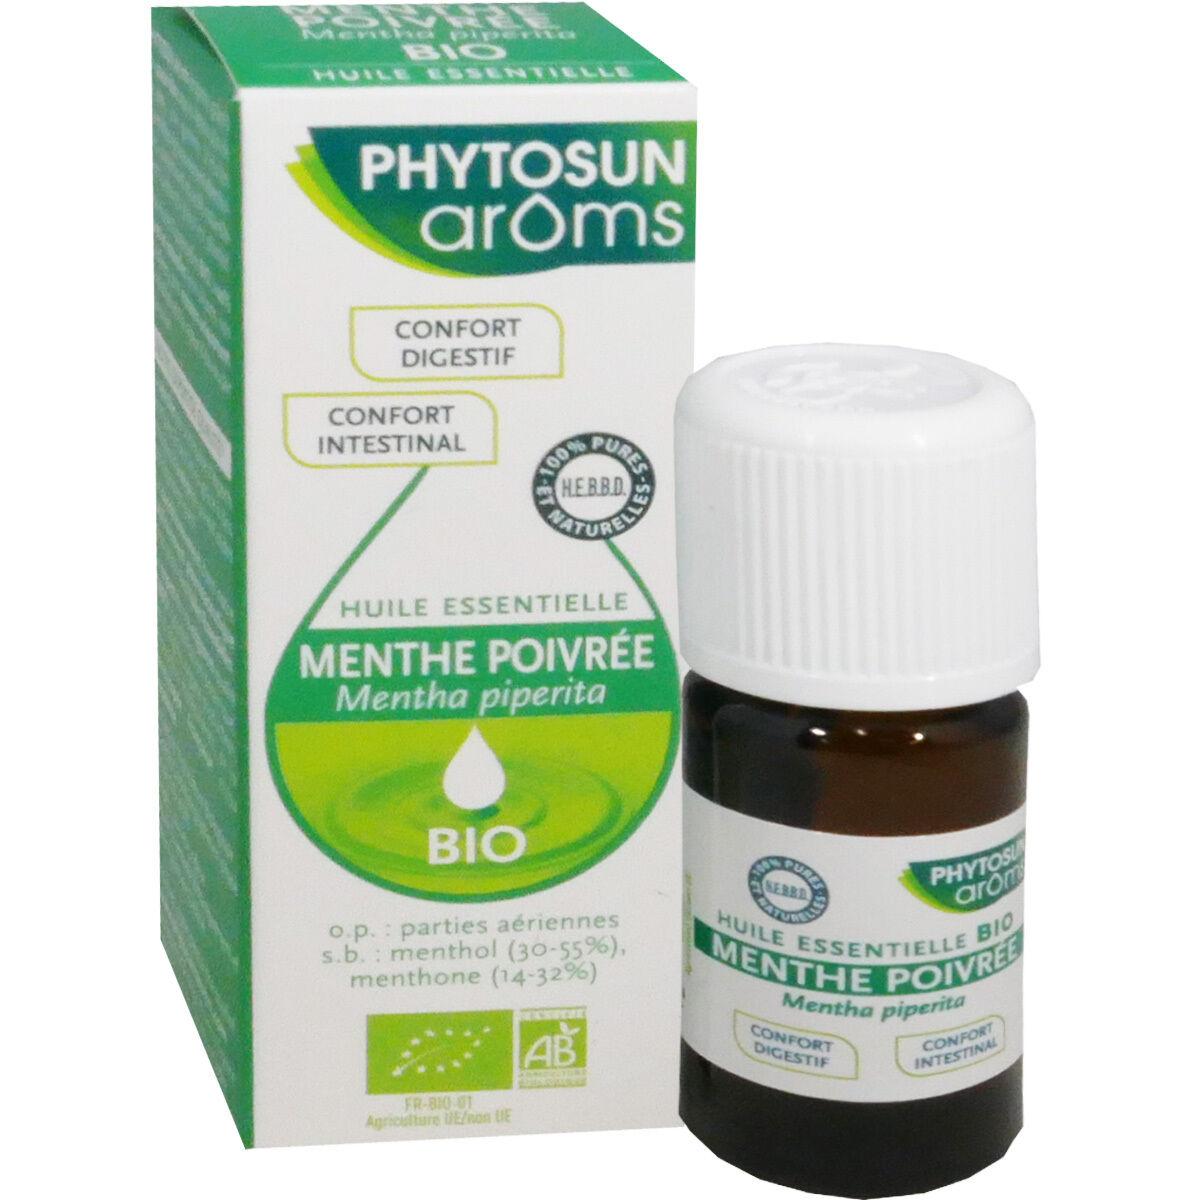 PHYTOSUN AROMS Phytosunaroms menthe poivree digestion 10 ml